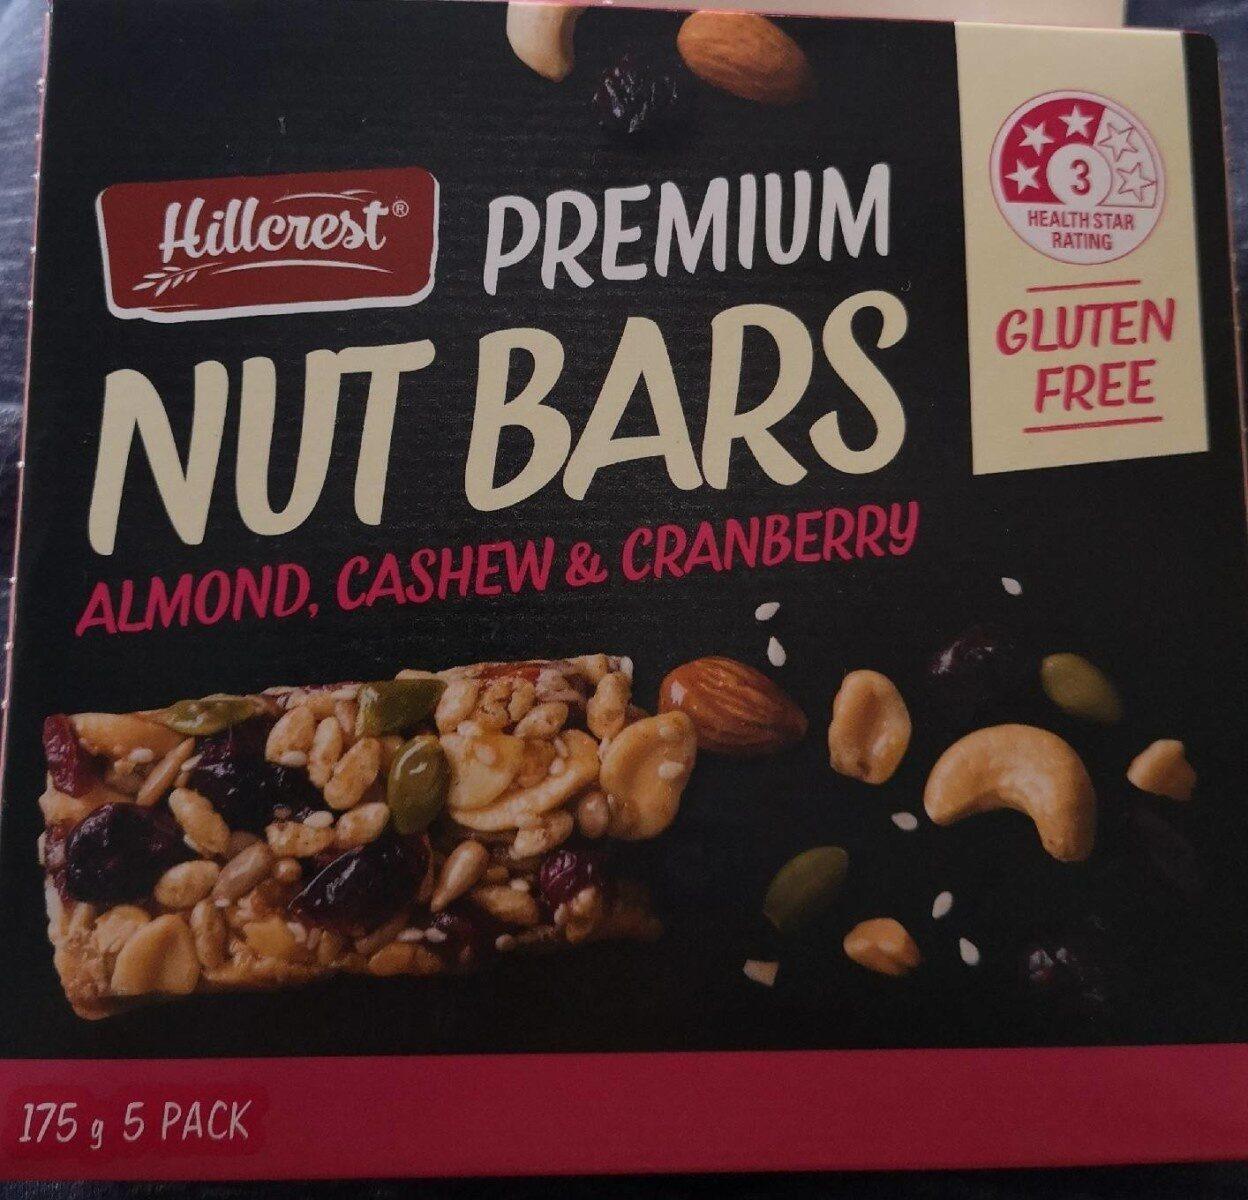 Premium Nut Bars - Almond, Cashew, Cranberries - Product